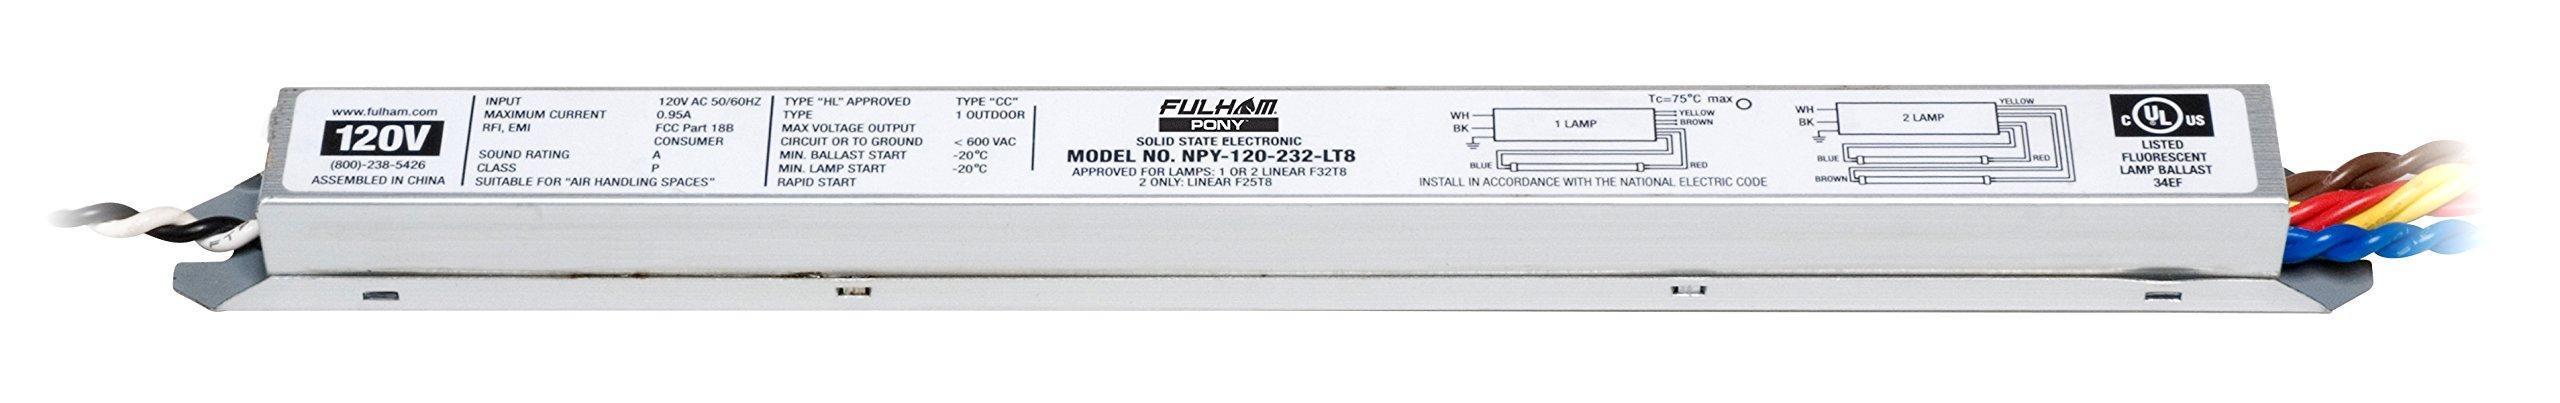 Fulham NPY-120-232-LT8 PONY Ballast